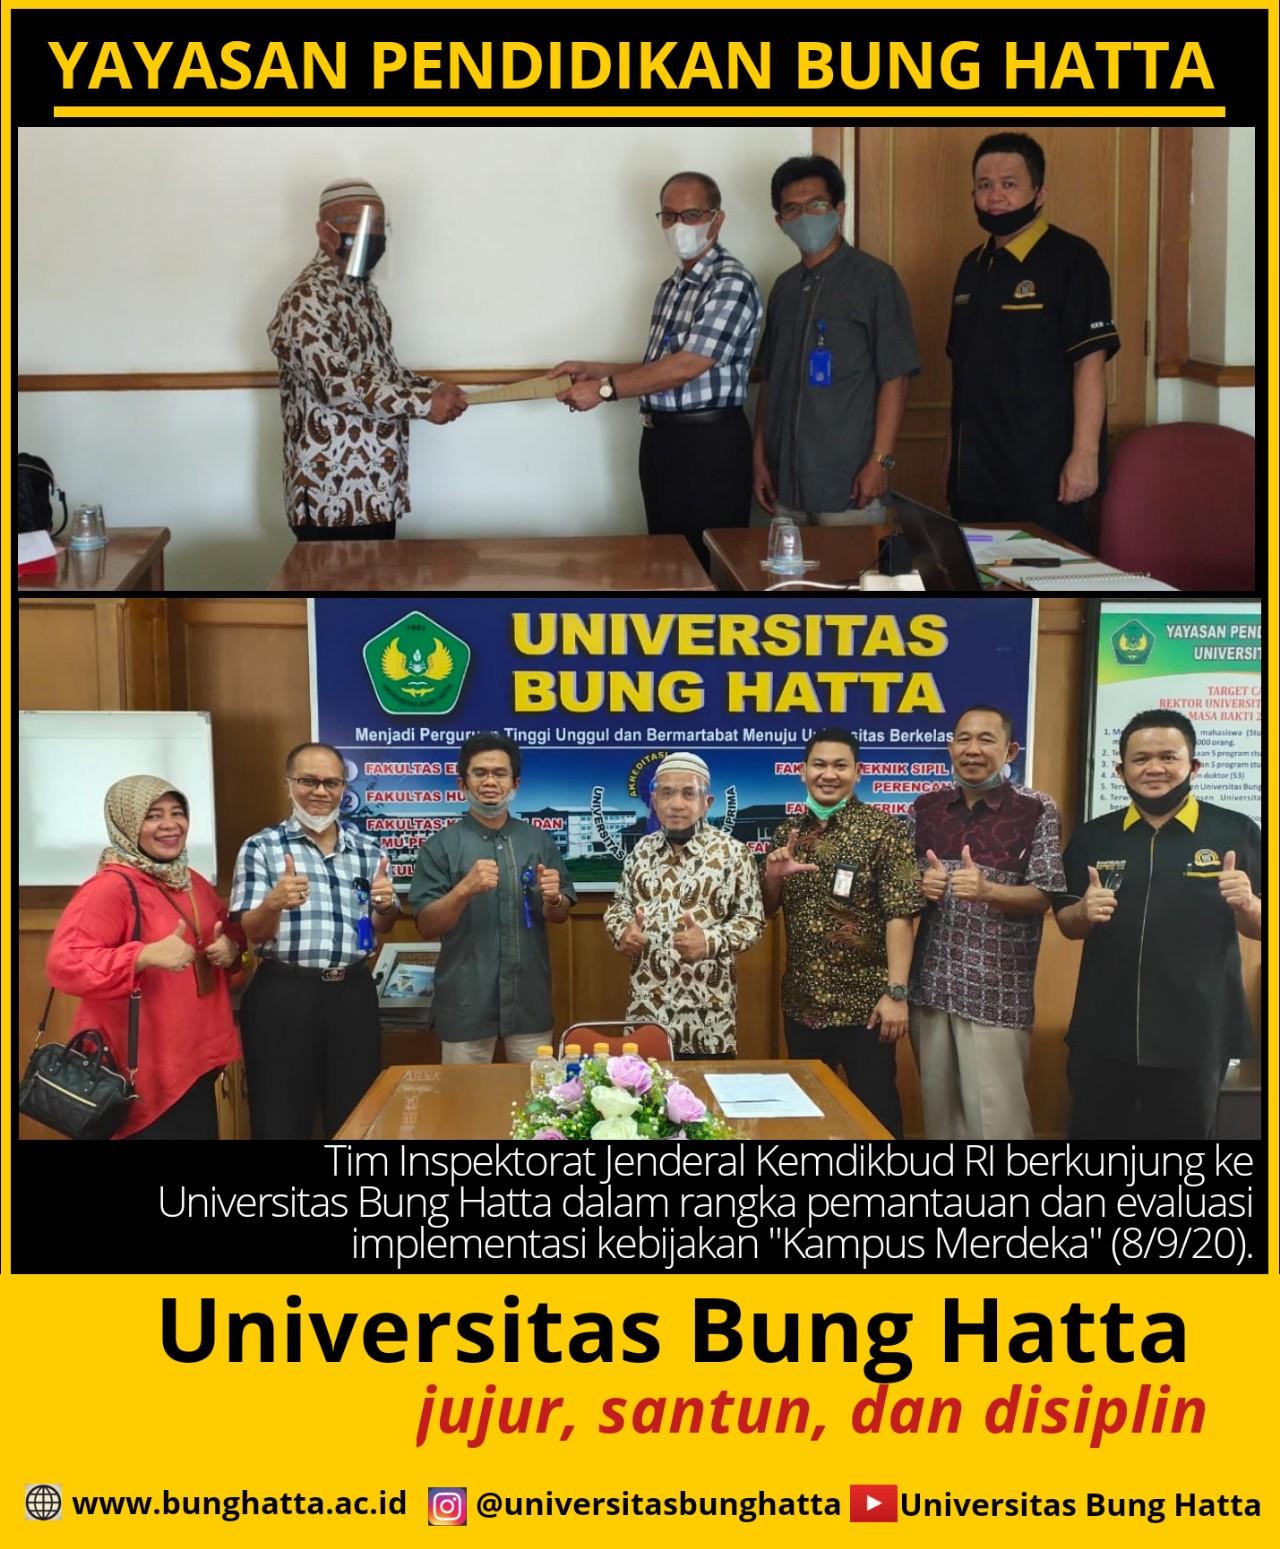 Tim Inspektorat Jenderal Kemdikbud RI Kunjungi Universitas Bung Hatta